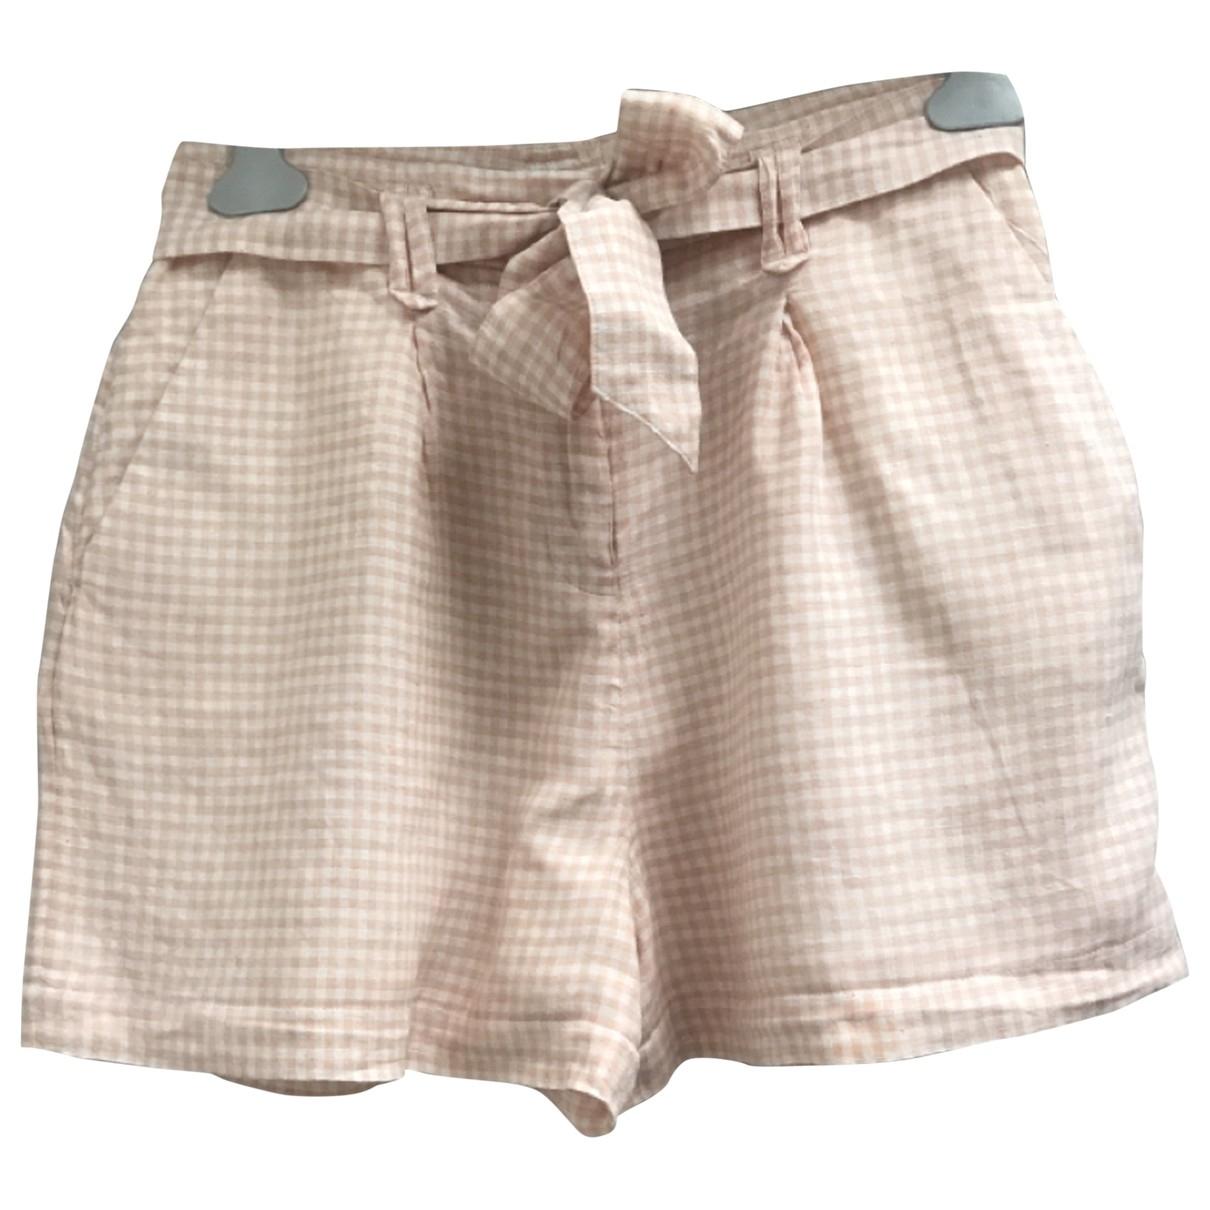 Sézane Spring Summer 2020 Pink Cotton Shorts for Women 36 FR